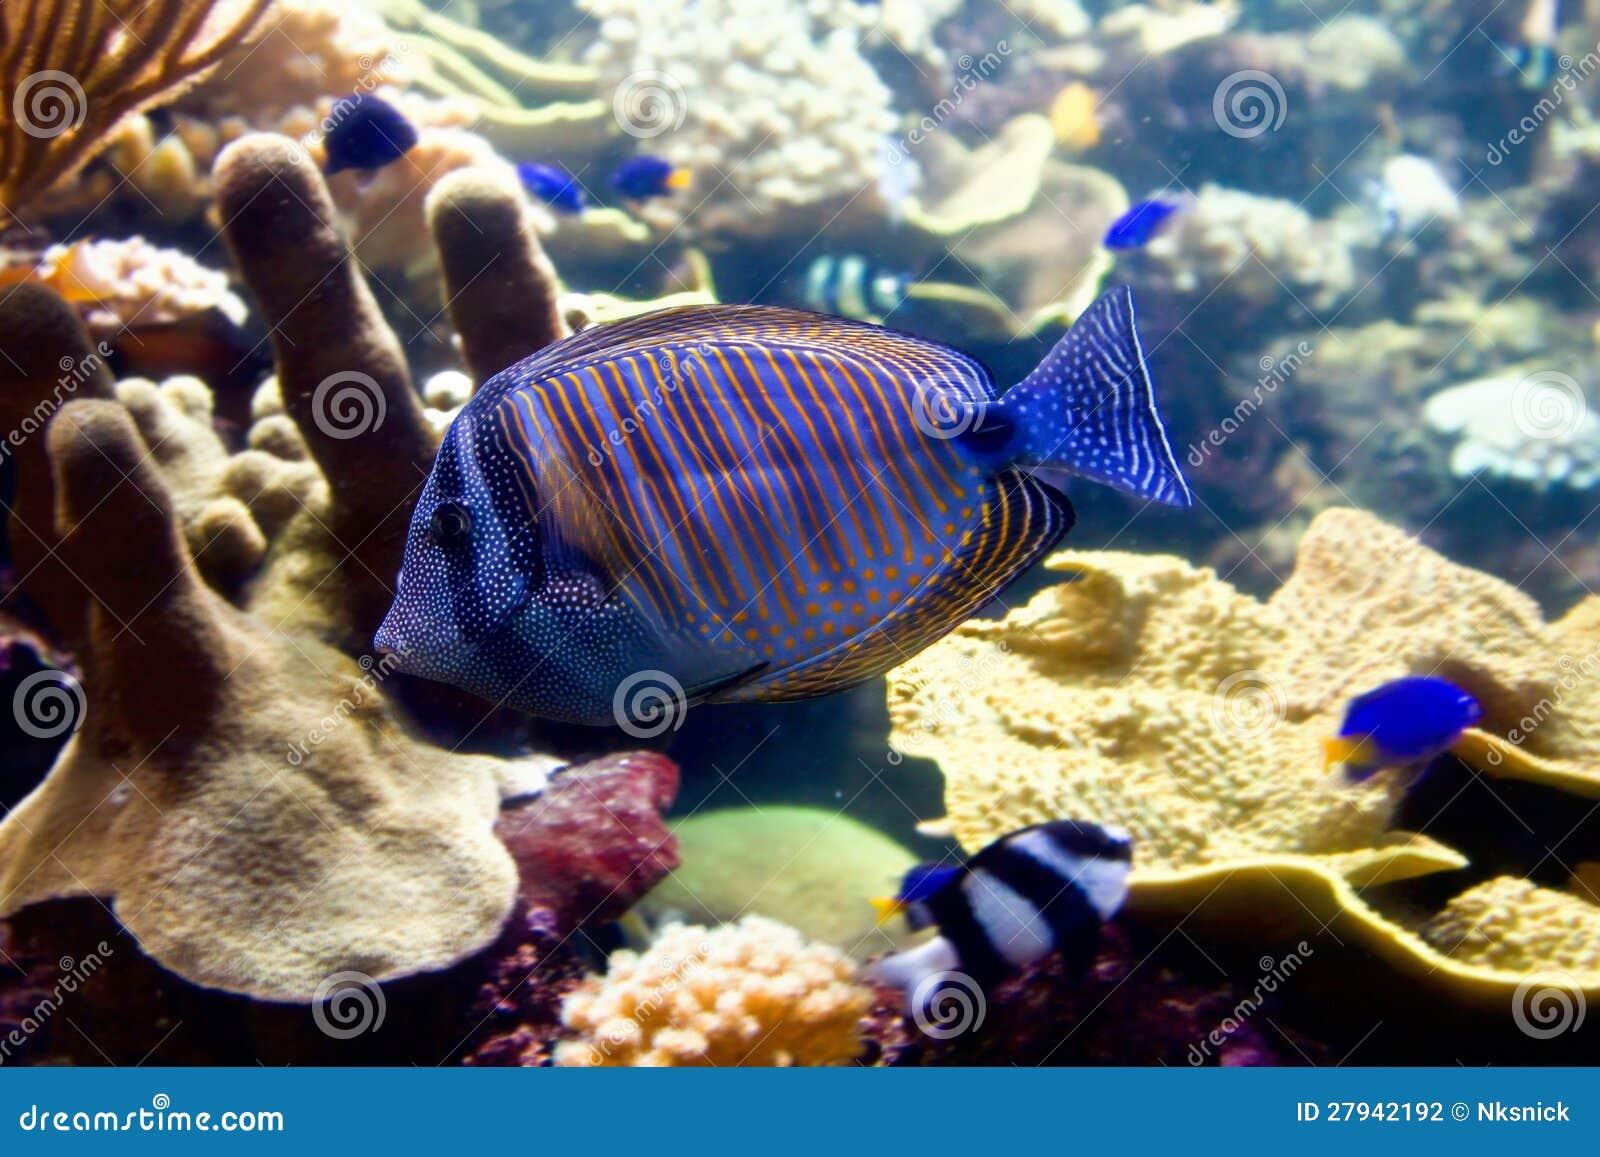 Blue Fish In The Aquarium Stock Photography Image 27942192